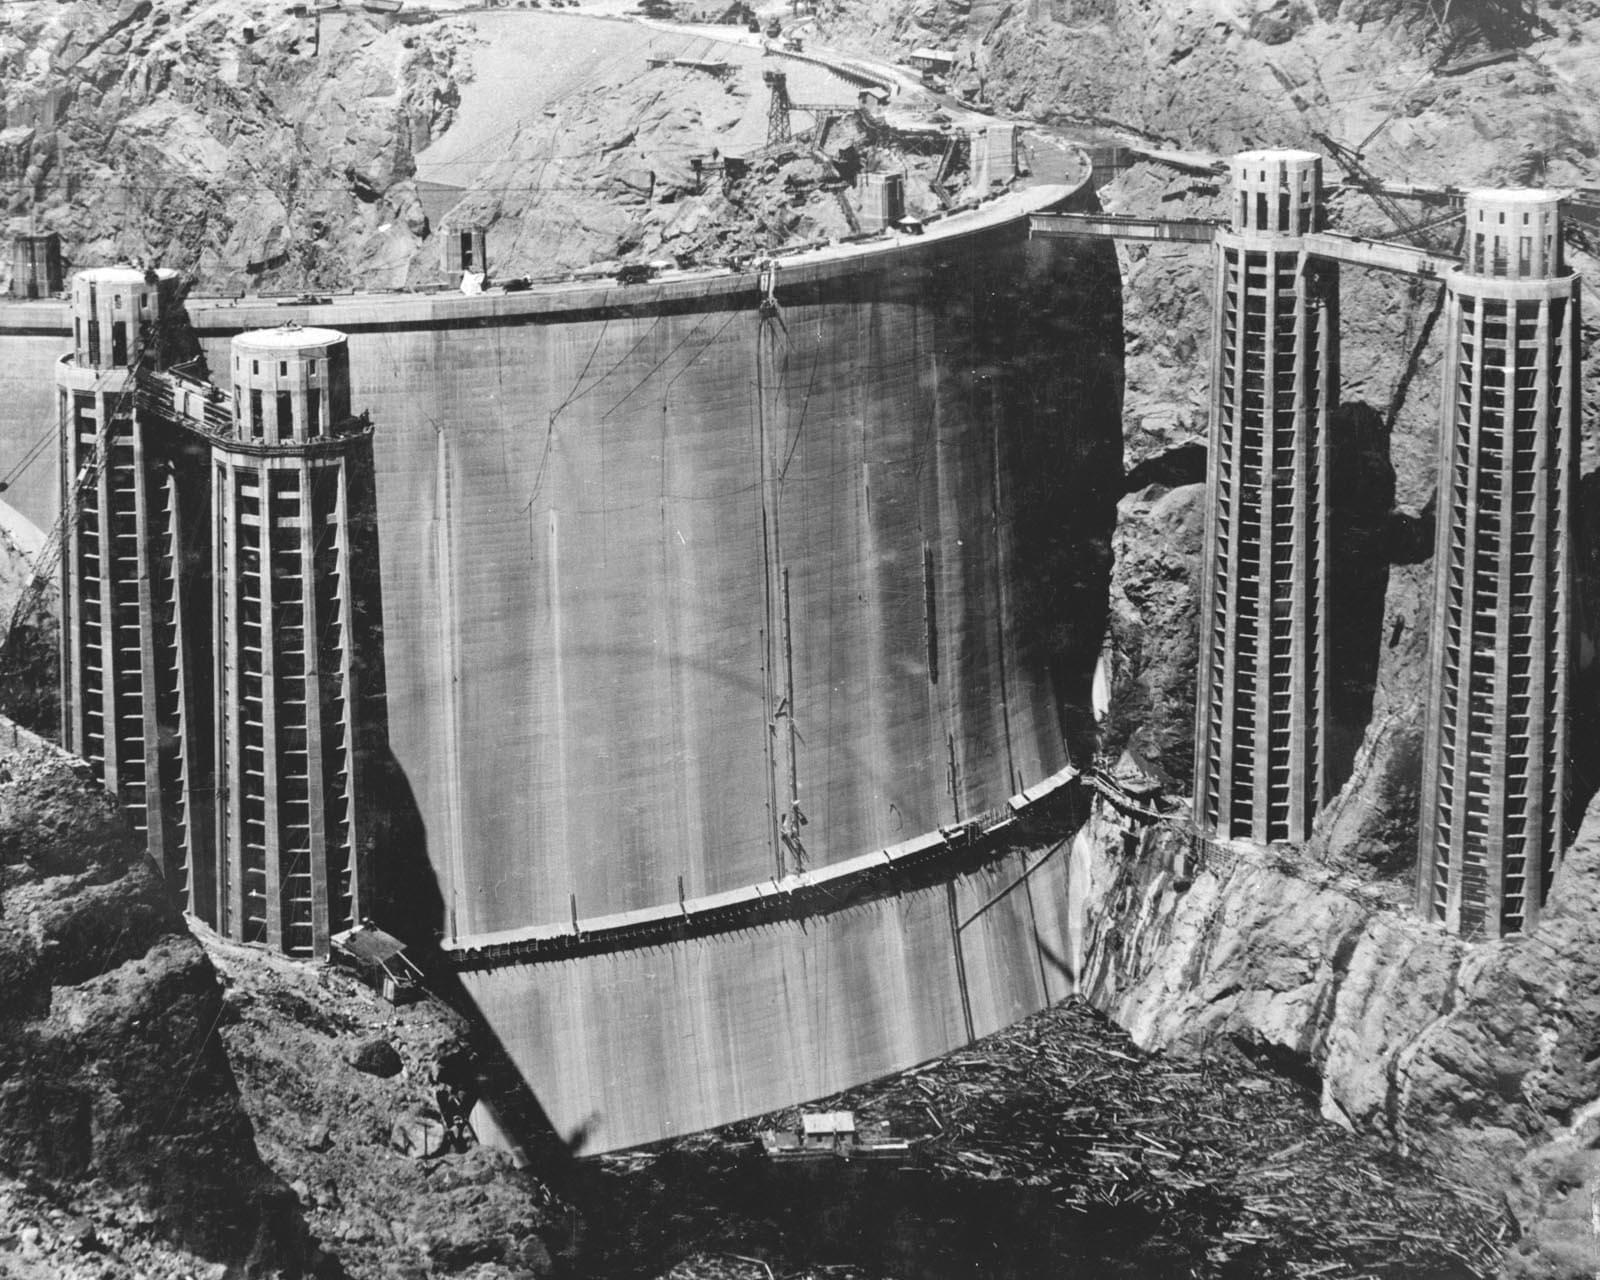 Damupstream